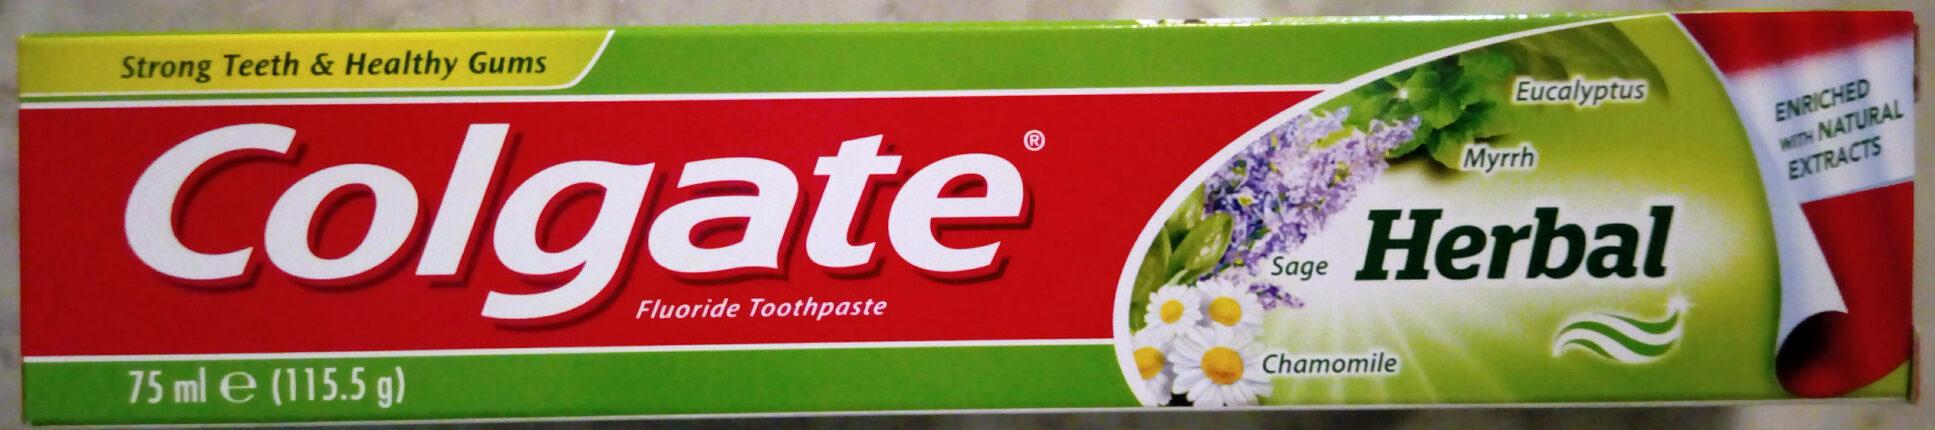 Colgate Herbal - Product